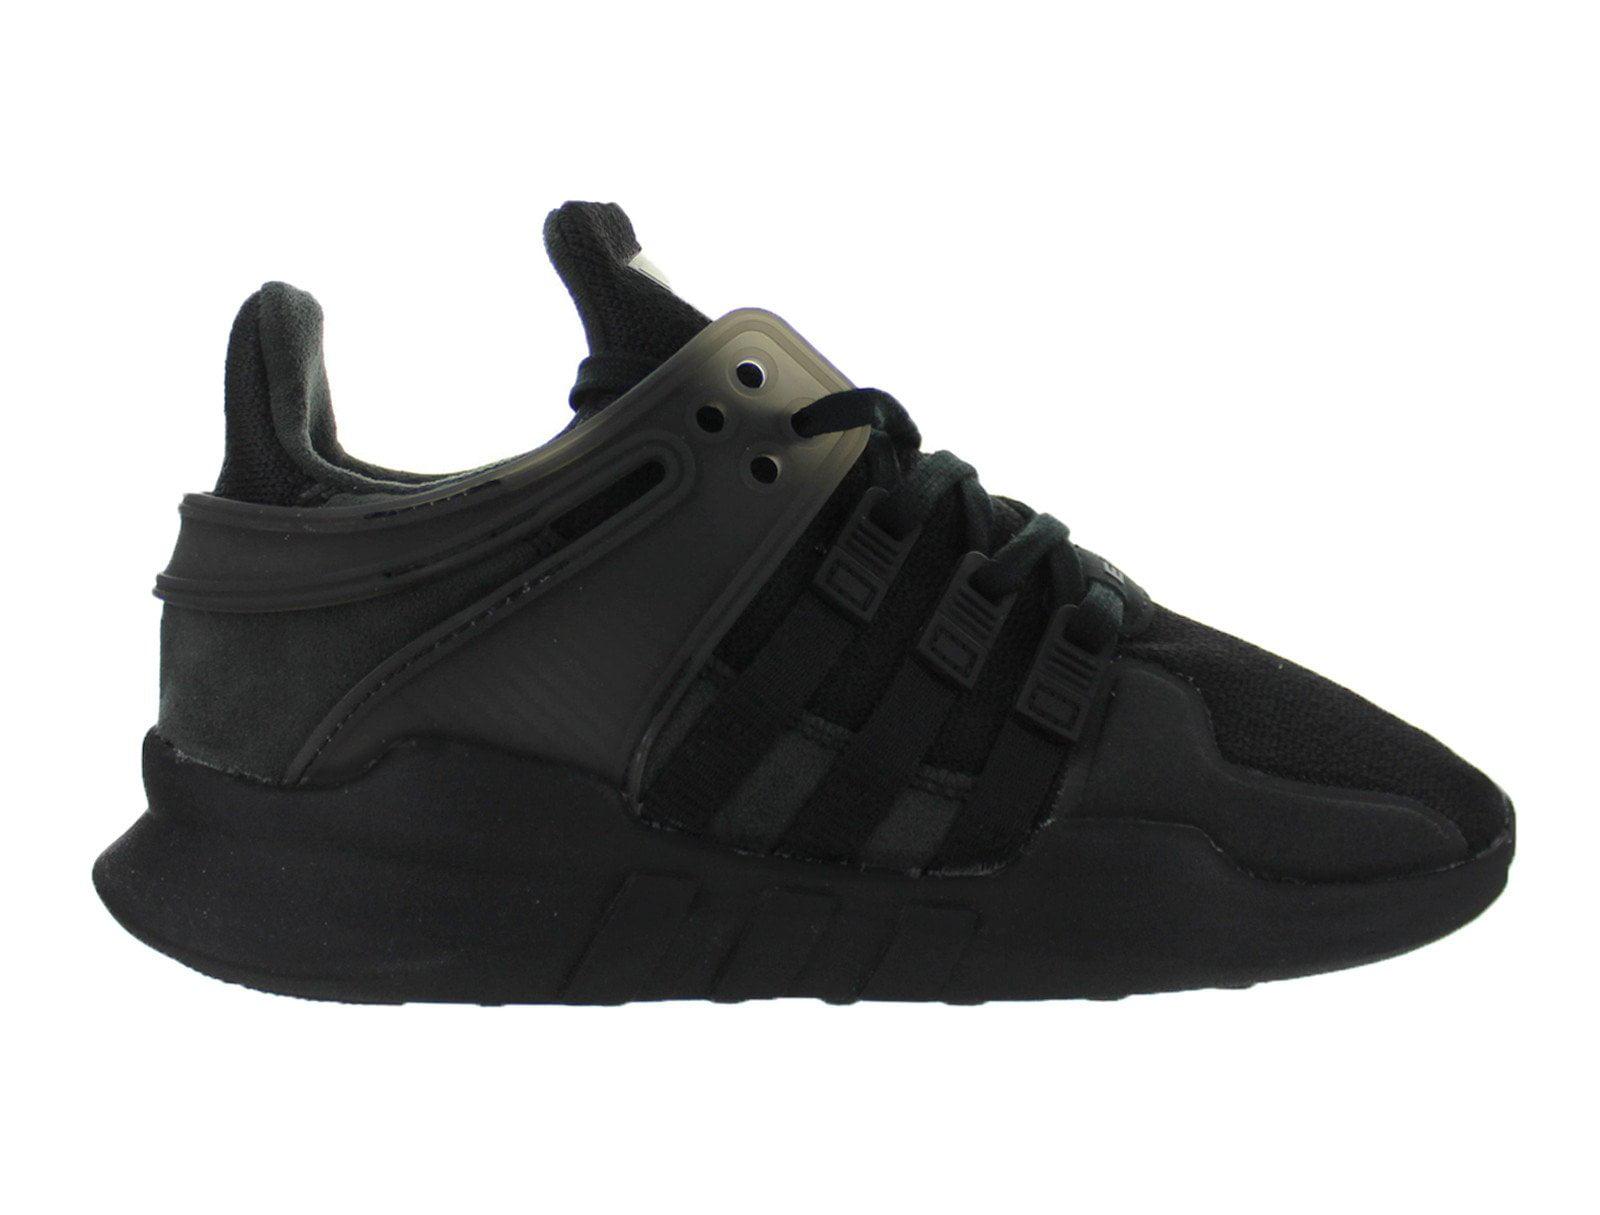 half off 1172e 8b5dc ... shopping kids adidas eqt equipment support adv j shadow core black  footwear whi walmart 92d1f 4df5c